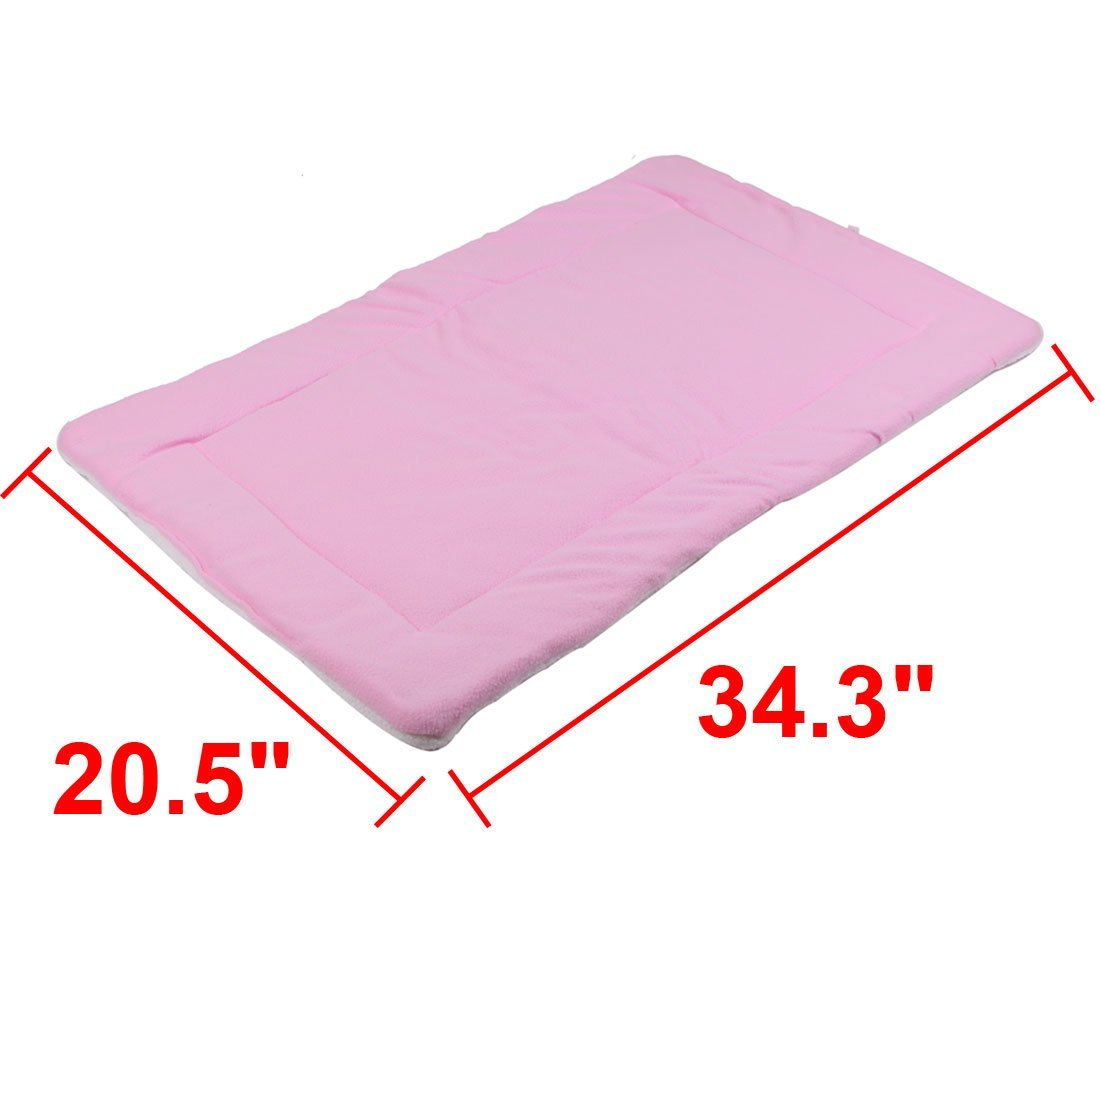 Amazon.com : Rosa DealMux Velo animais Cat Dog Blanket Indoor cama dormindo para se sentar Mat Pad Almofada : Pet Supplies